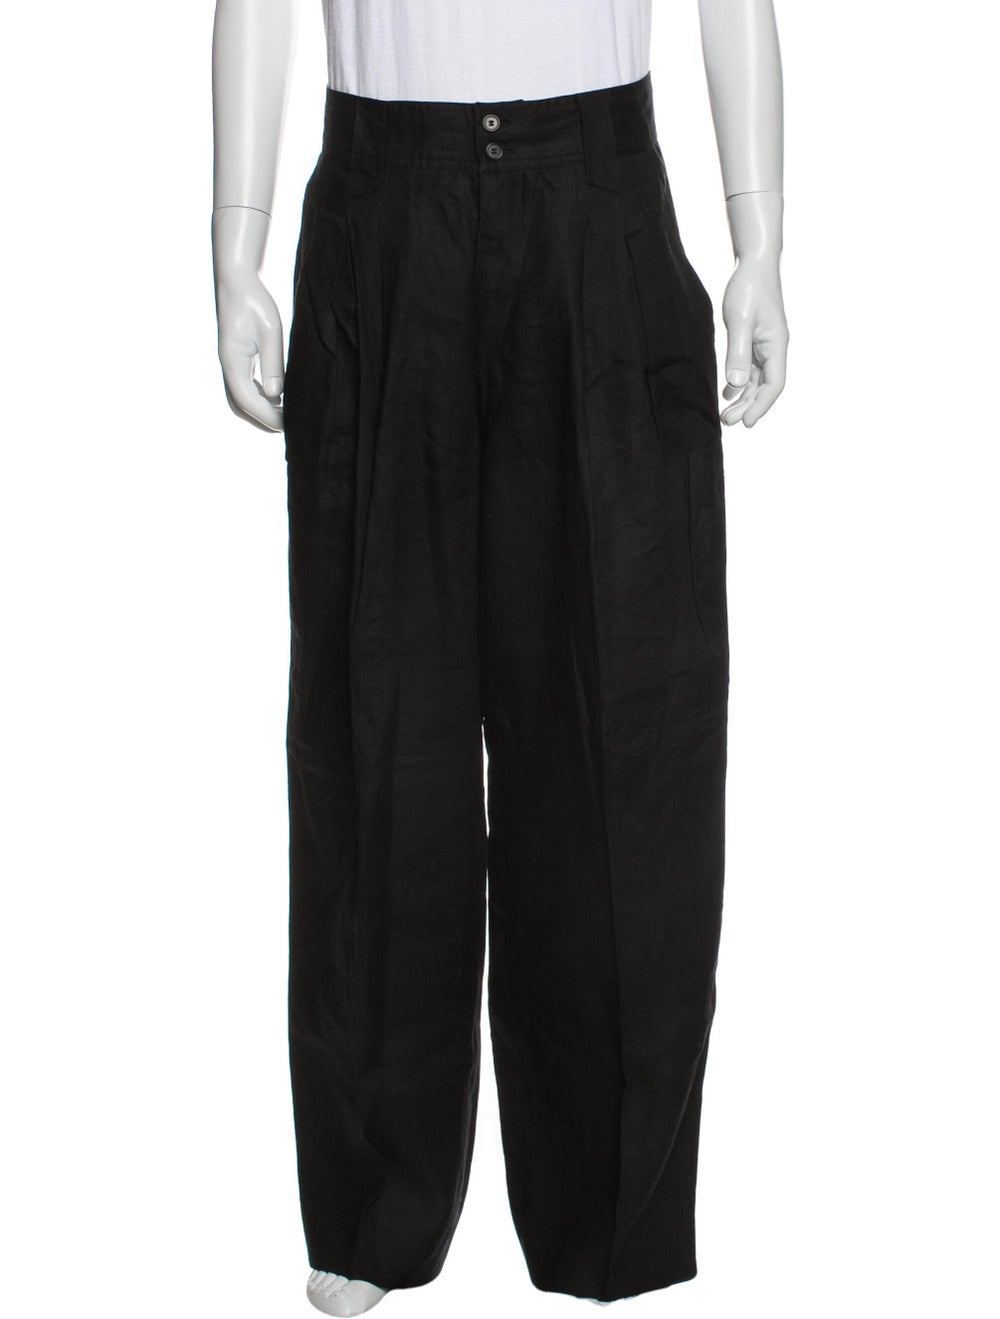 Gianni Versace Vintage Pants Black - image 1